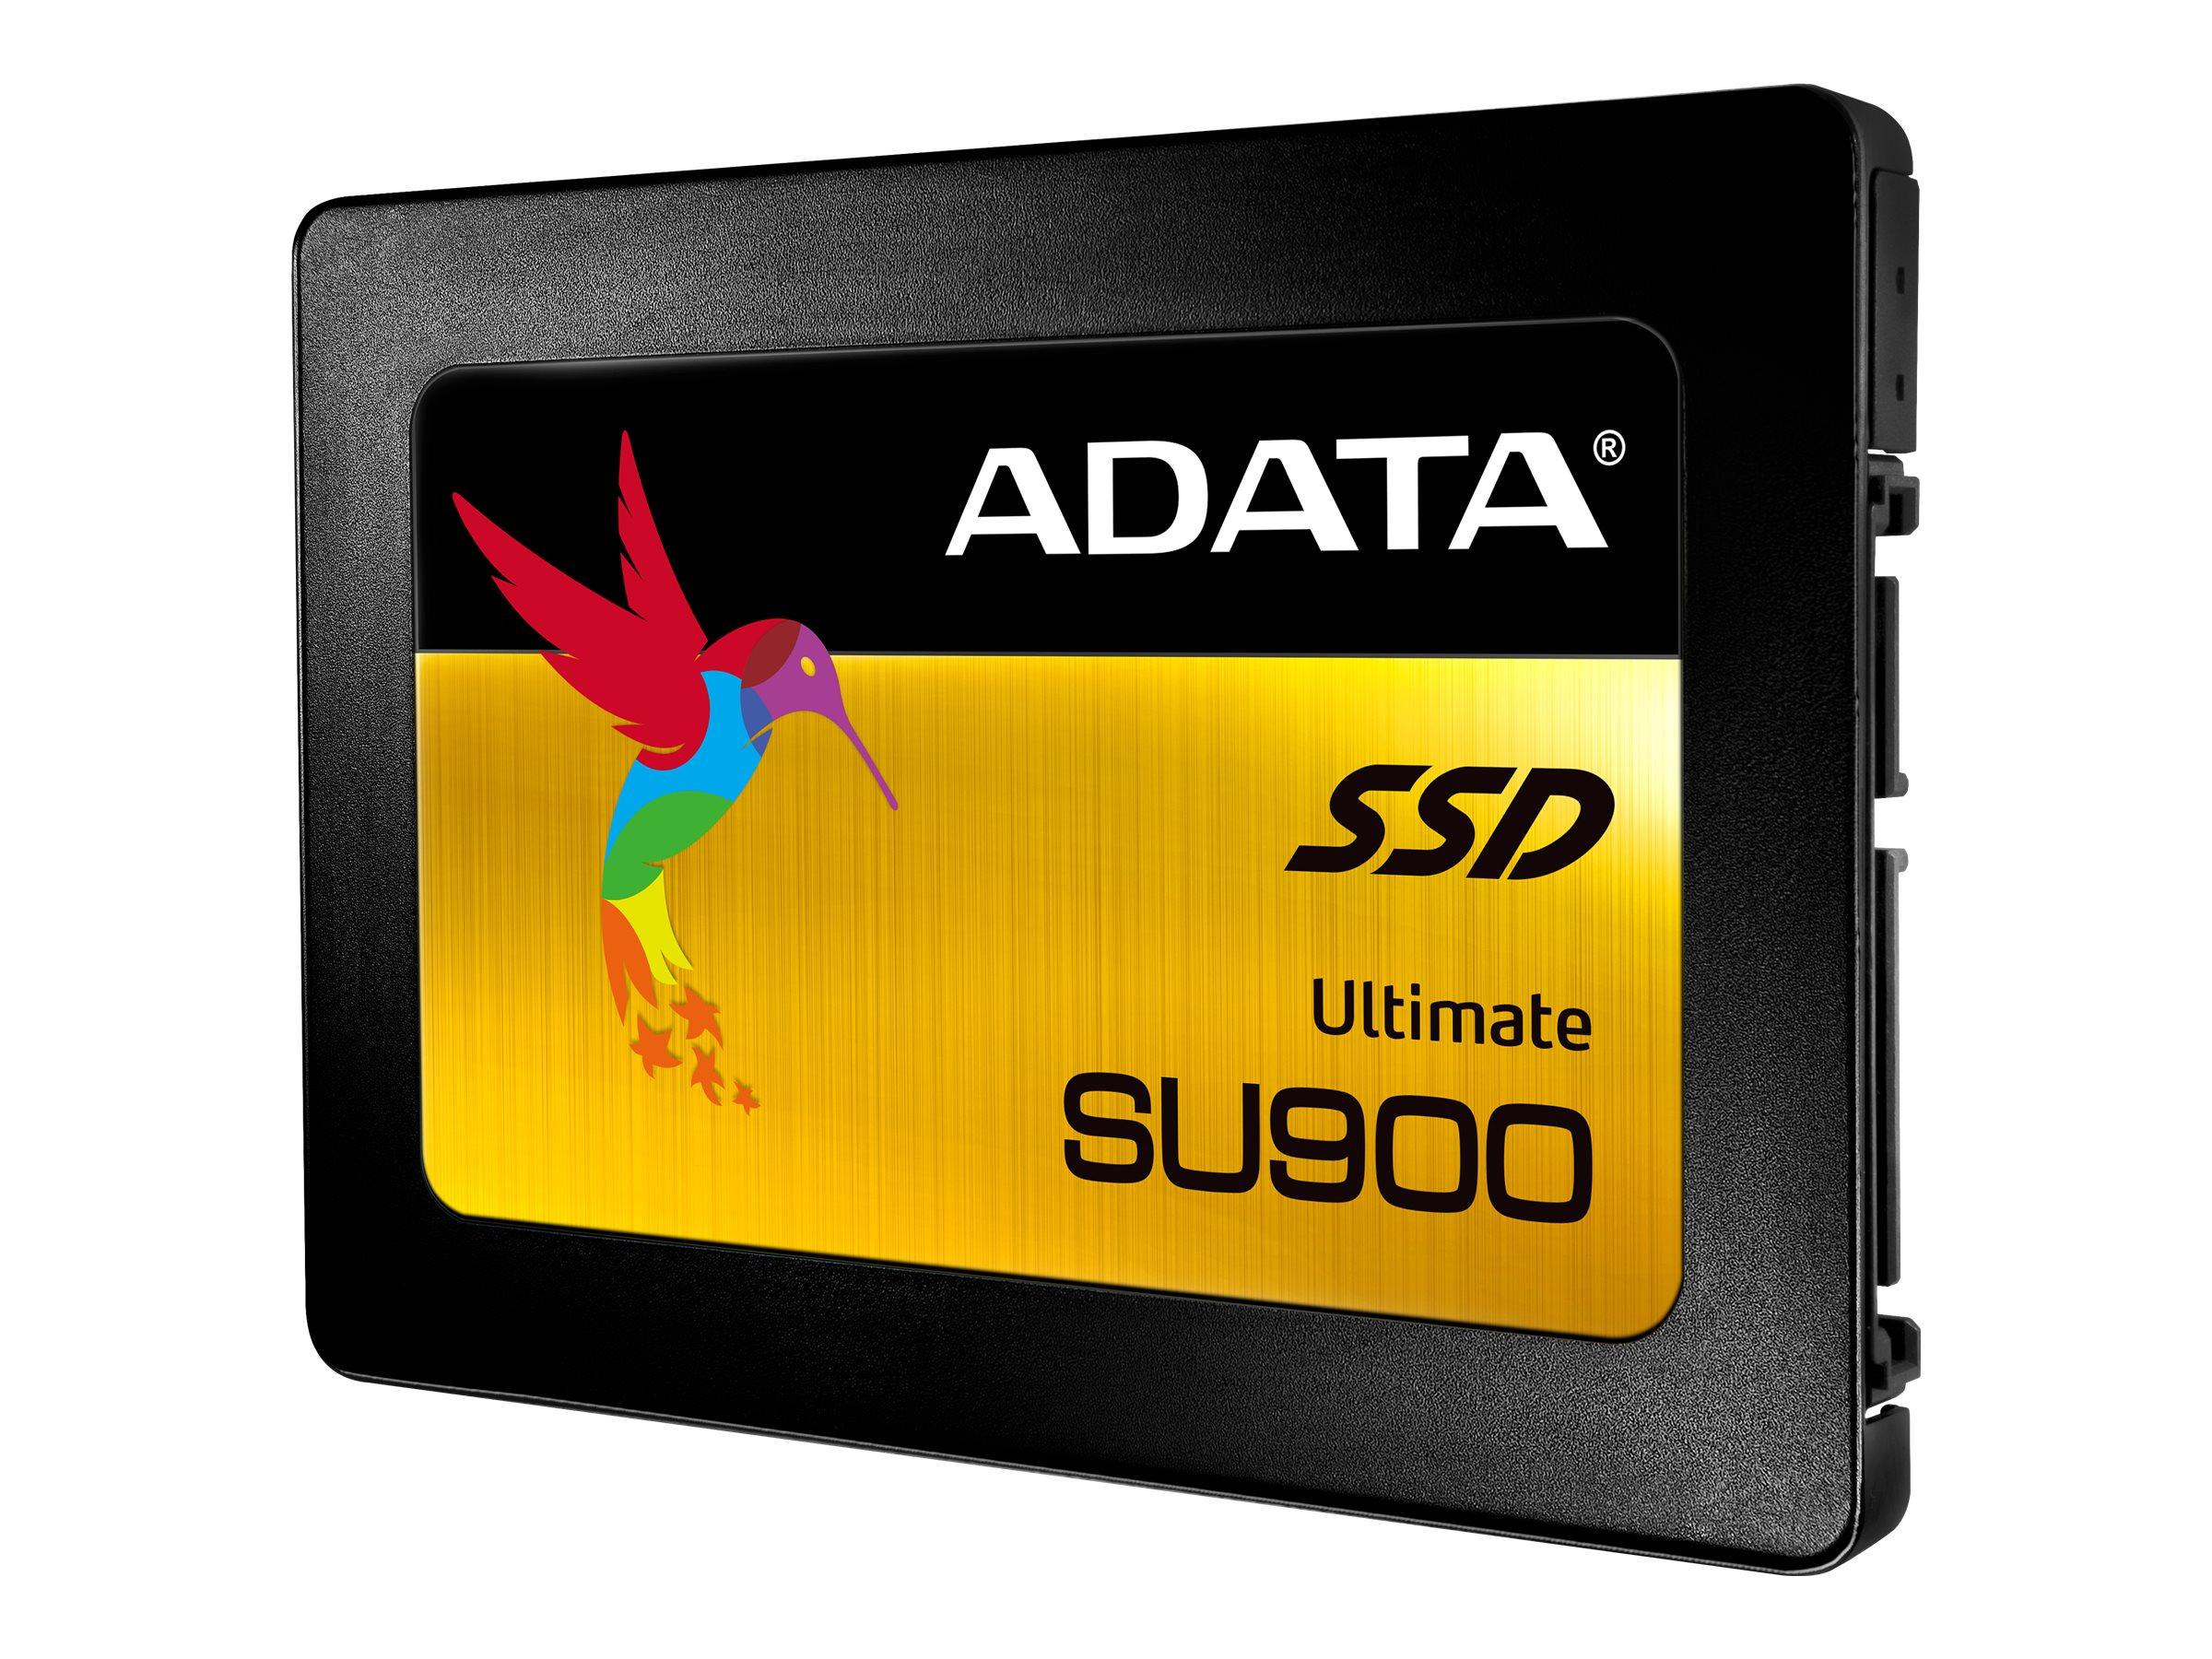 DCS - Bærbar Harddisk - ADATA Ultimate SSD SU900 1TB 2 5